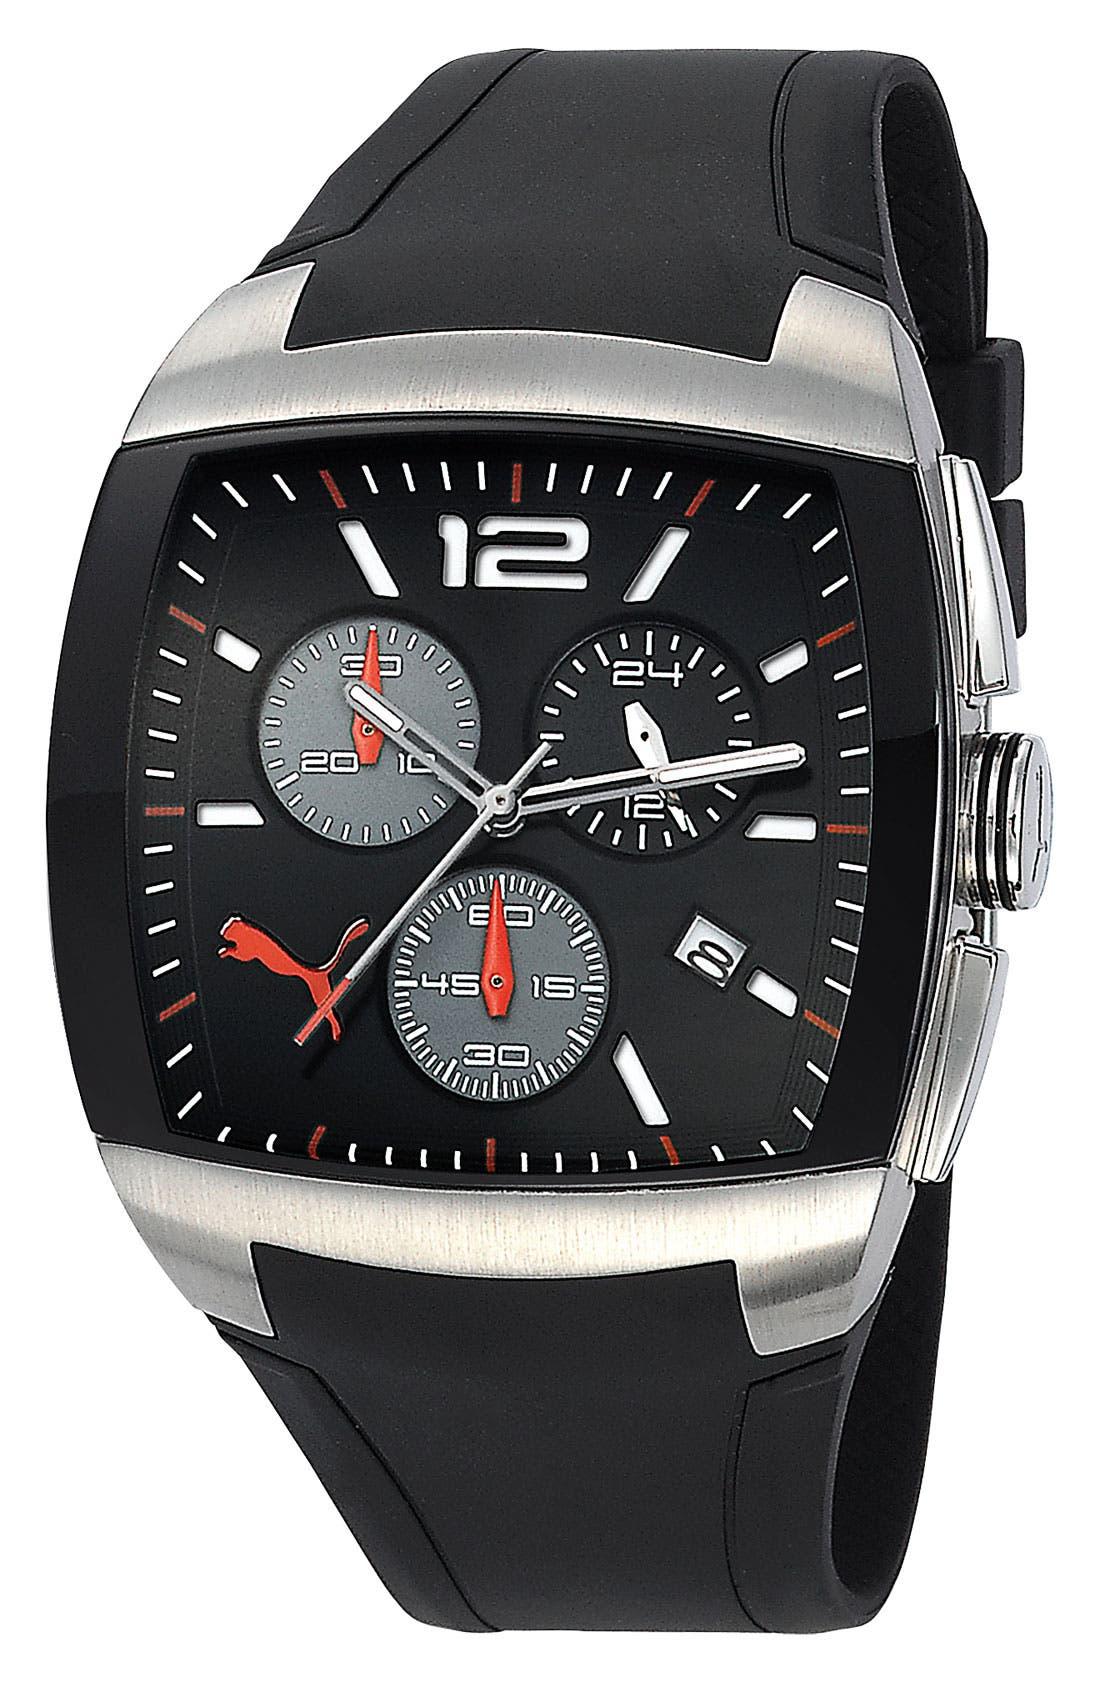 Alternate Image 1 Selected - PUMA 'GT Chronograph' Analog Watch, 44mm